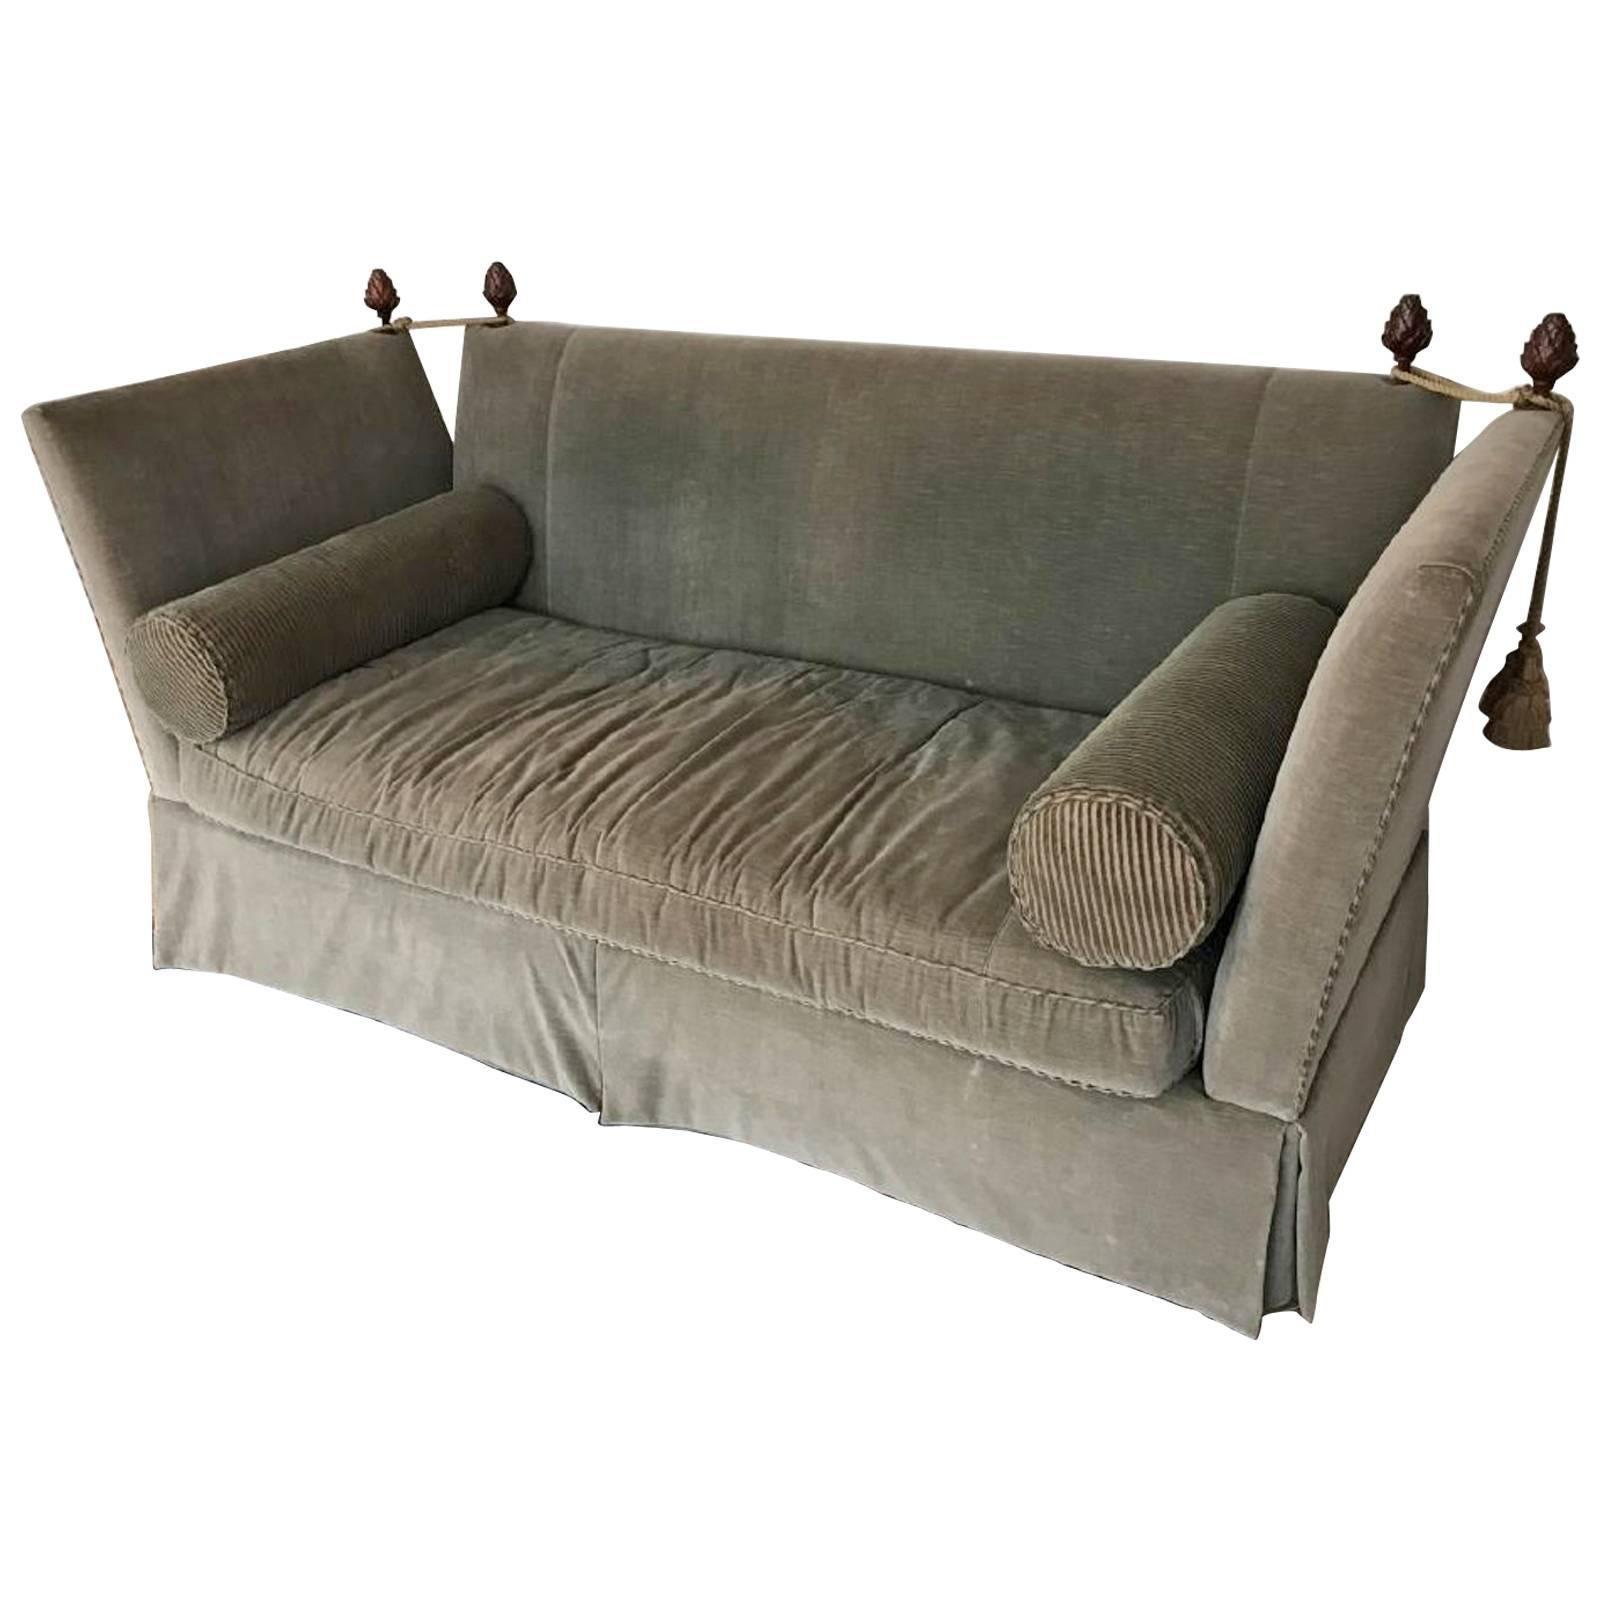 Genial Flared Arm Tuxedo Knole Style Sofa